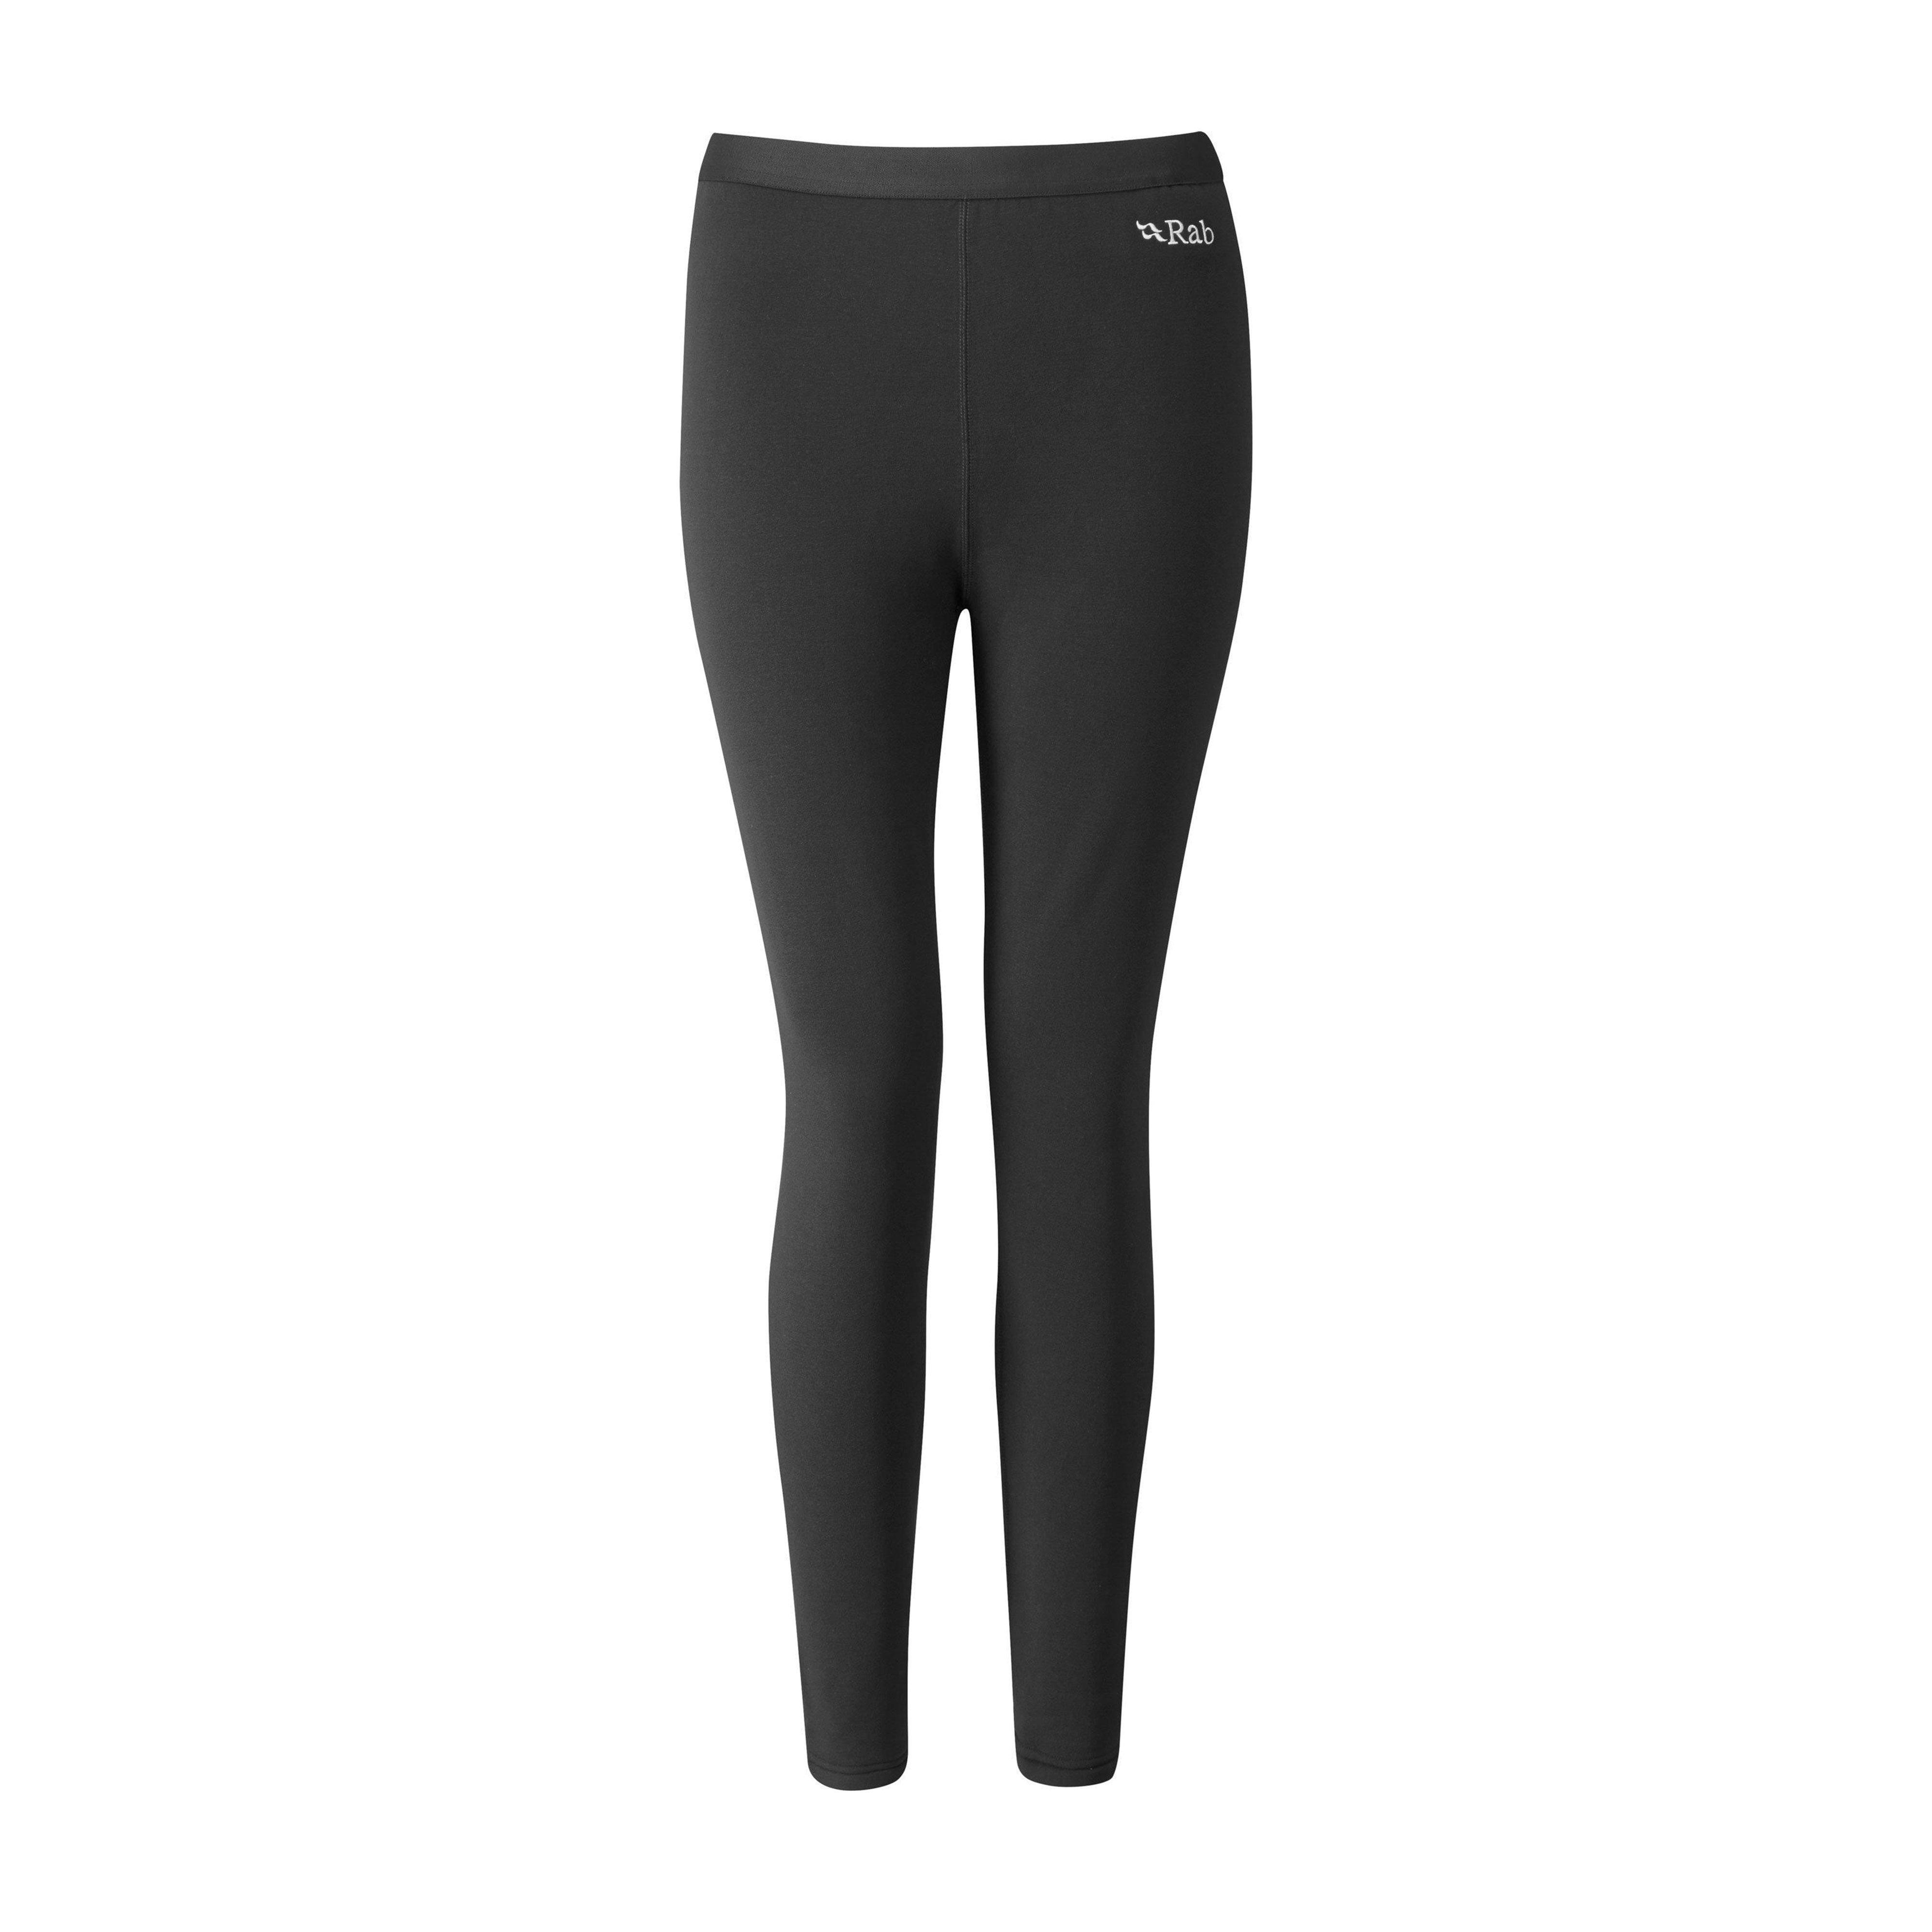 Rab Women's Power Stretch Pro Pants, BLACK/WOMENS